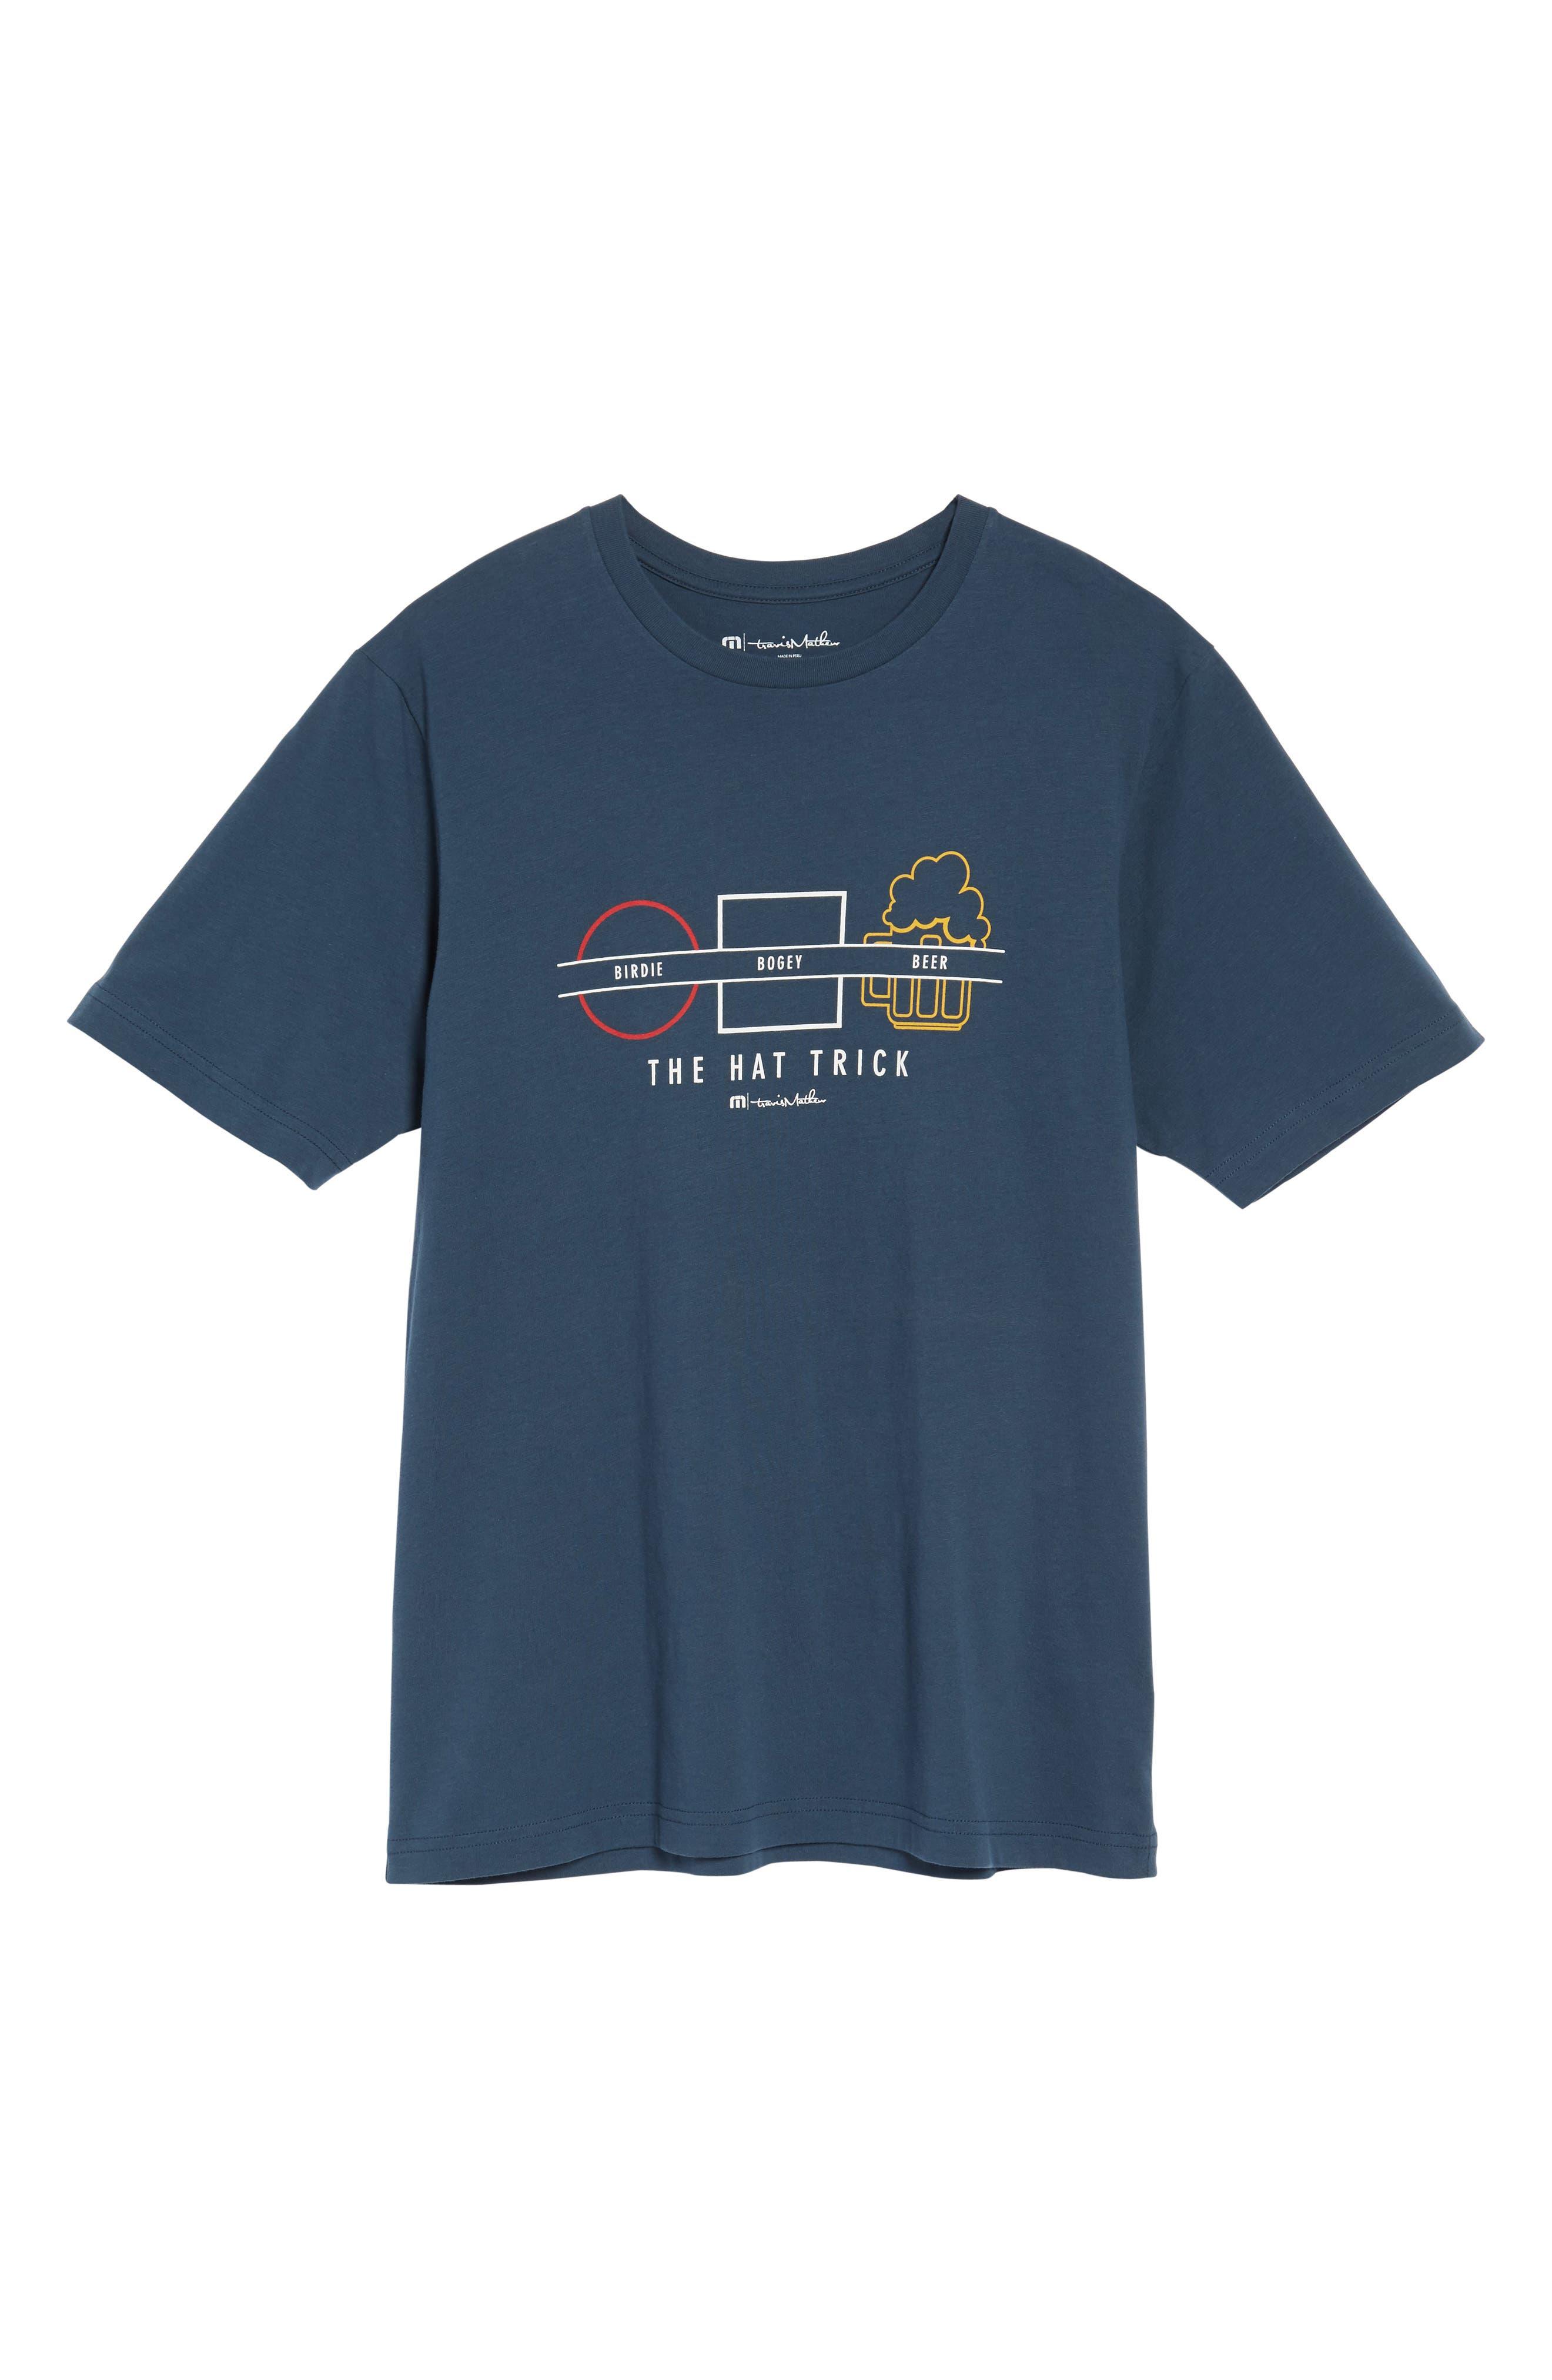 PBFU Graphic T-Shirt,                             Alternate thumbnail 6, color,                             400